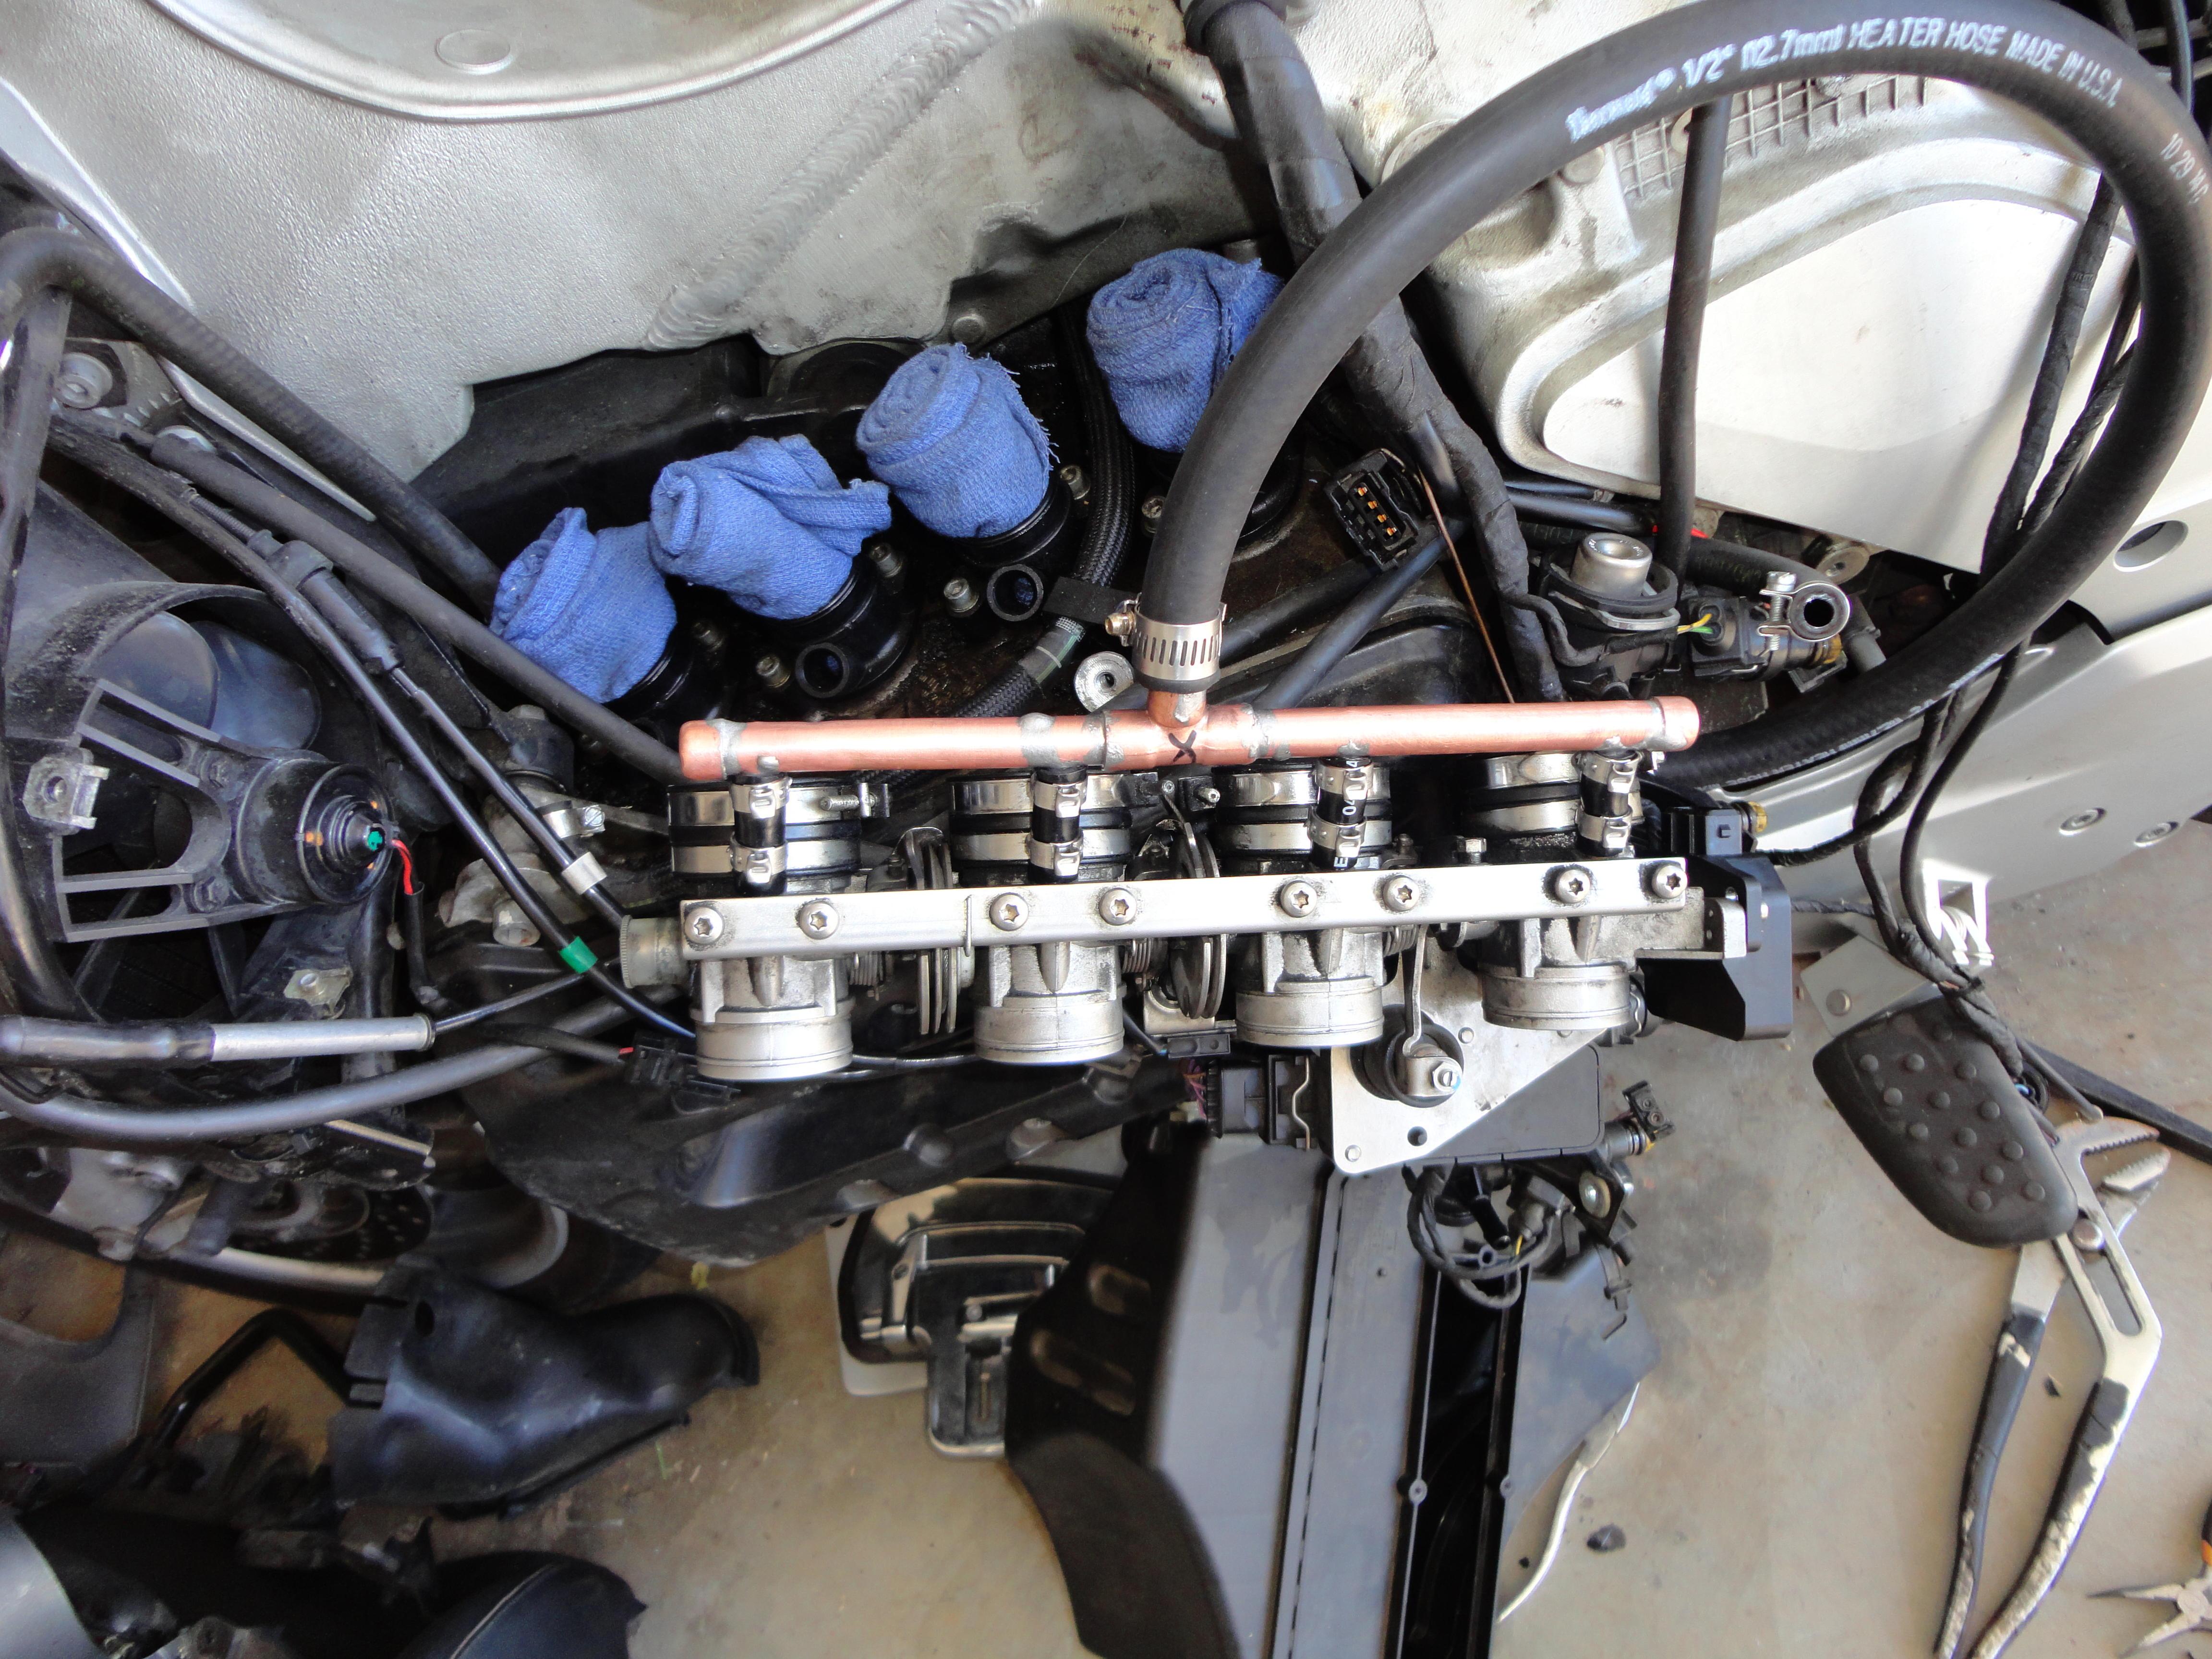 Attaching Crankcase Breather Hose - BMW Luxury Touring Community